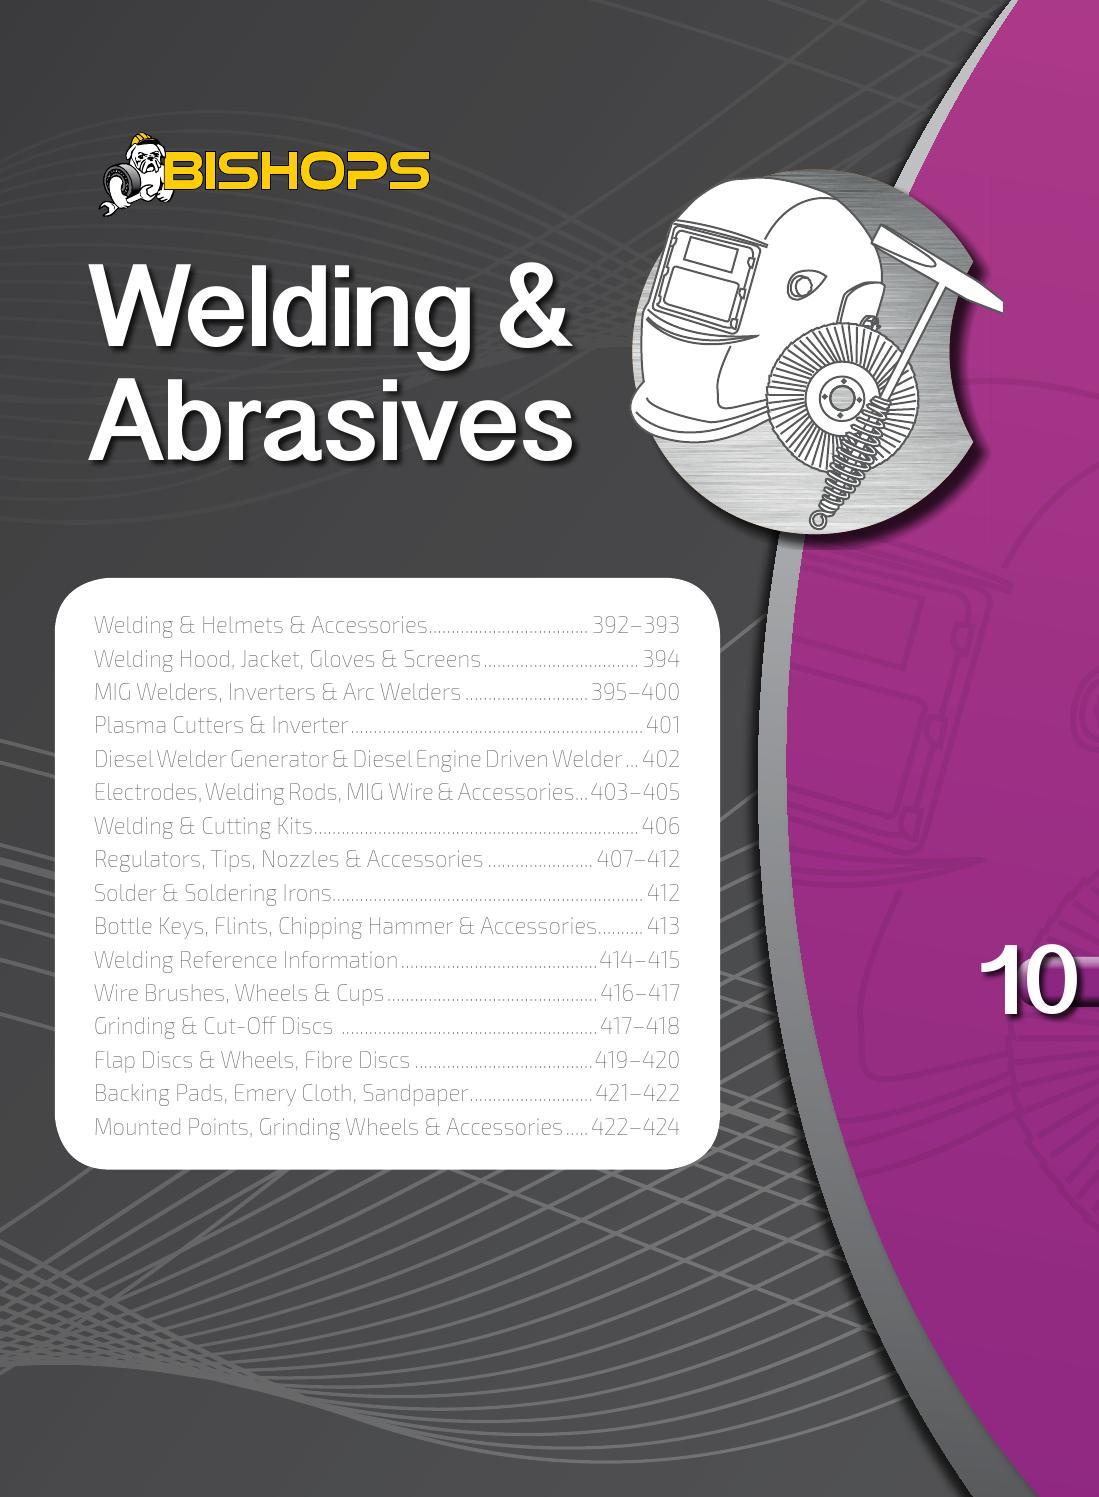 Bishops Welding Abrasives By Atom Issuu Tig Handpiece Diagram